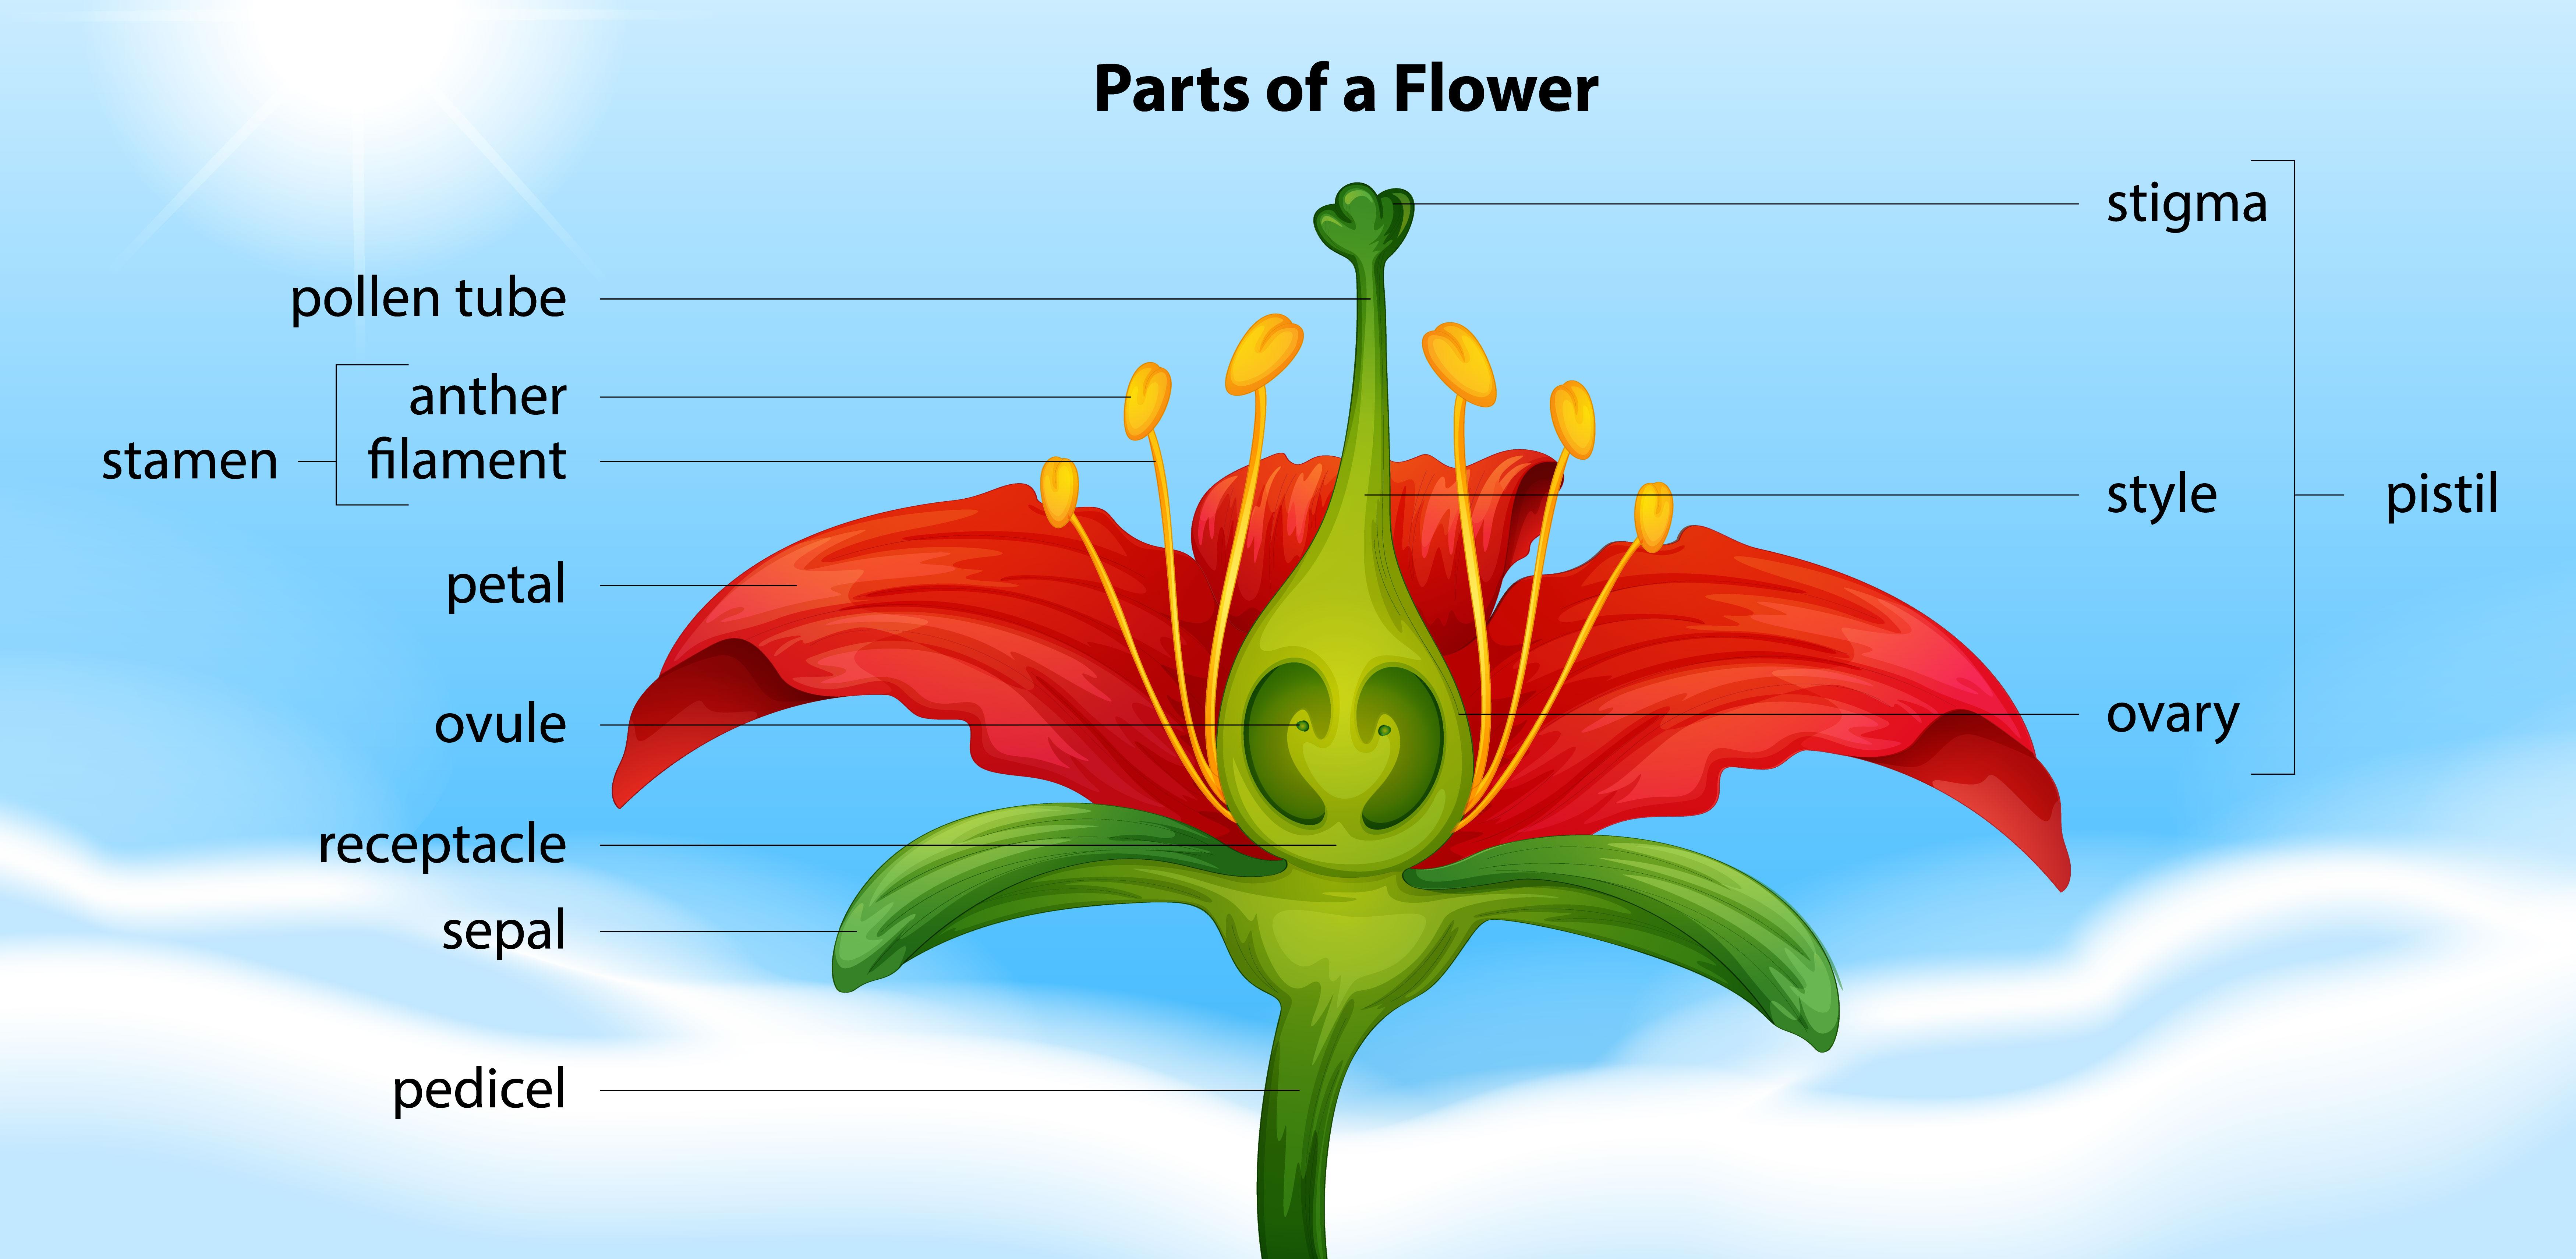 Parts of a flower - Download Free Vectors, Clipart ...